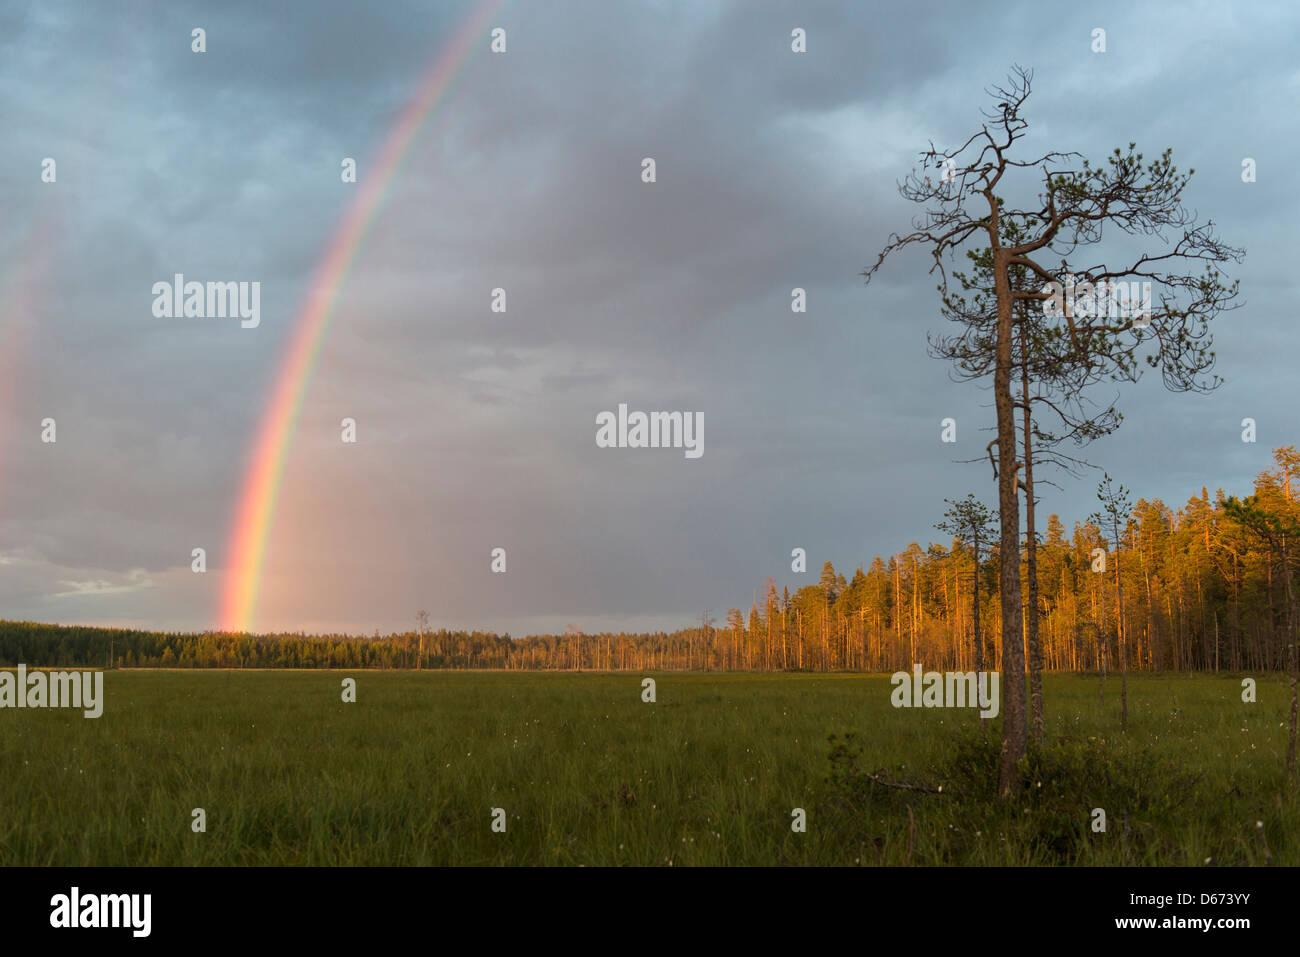 rainbow over finnish landscape, finland - Stock Image